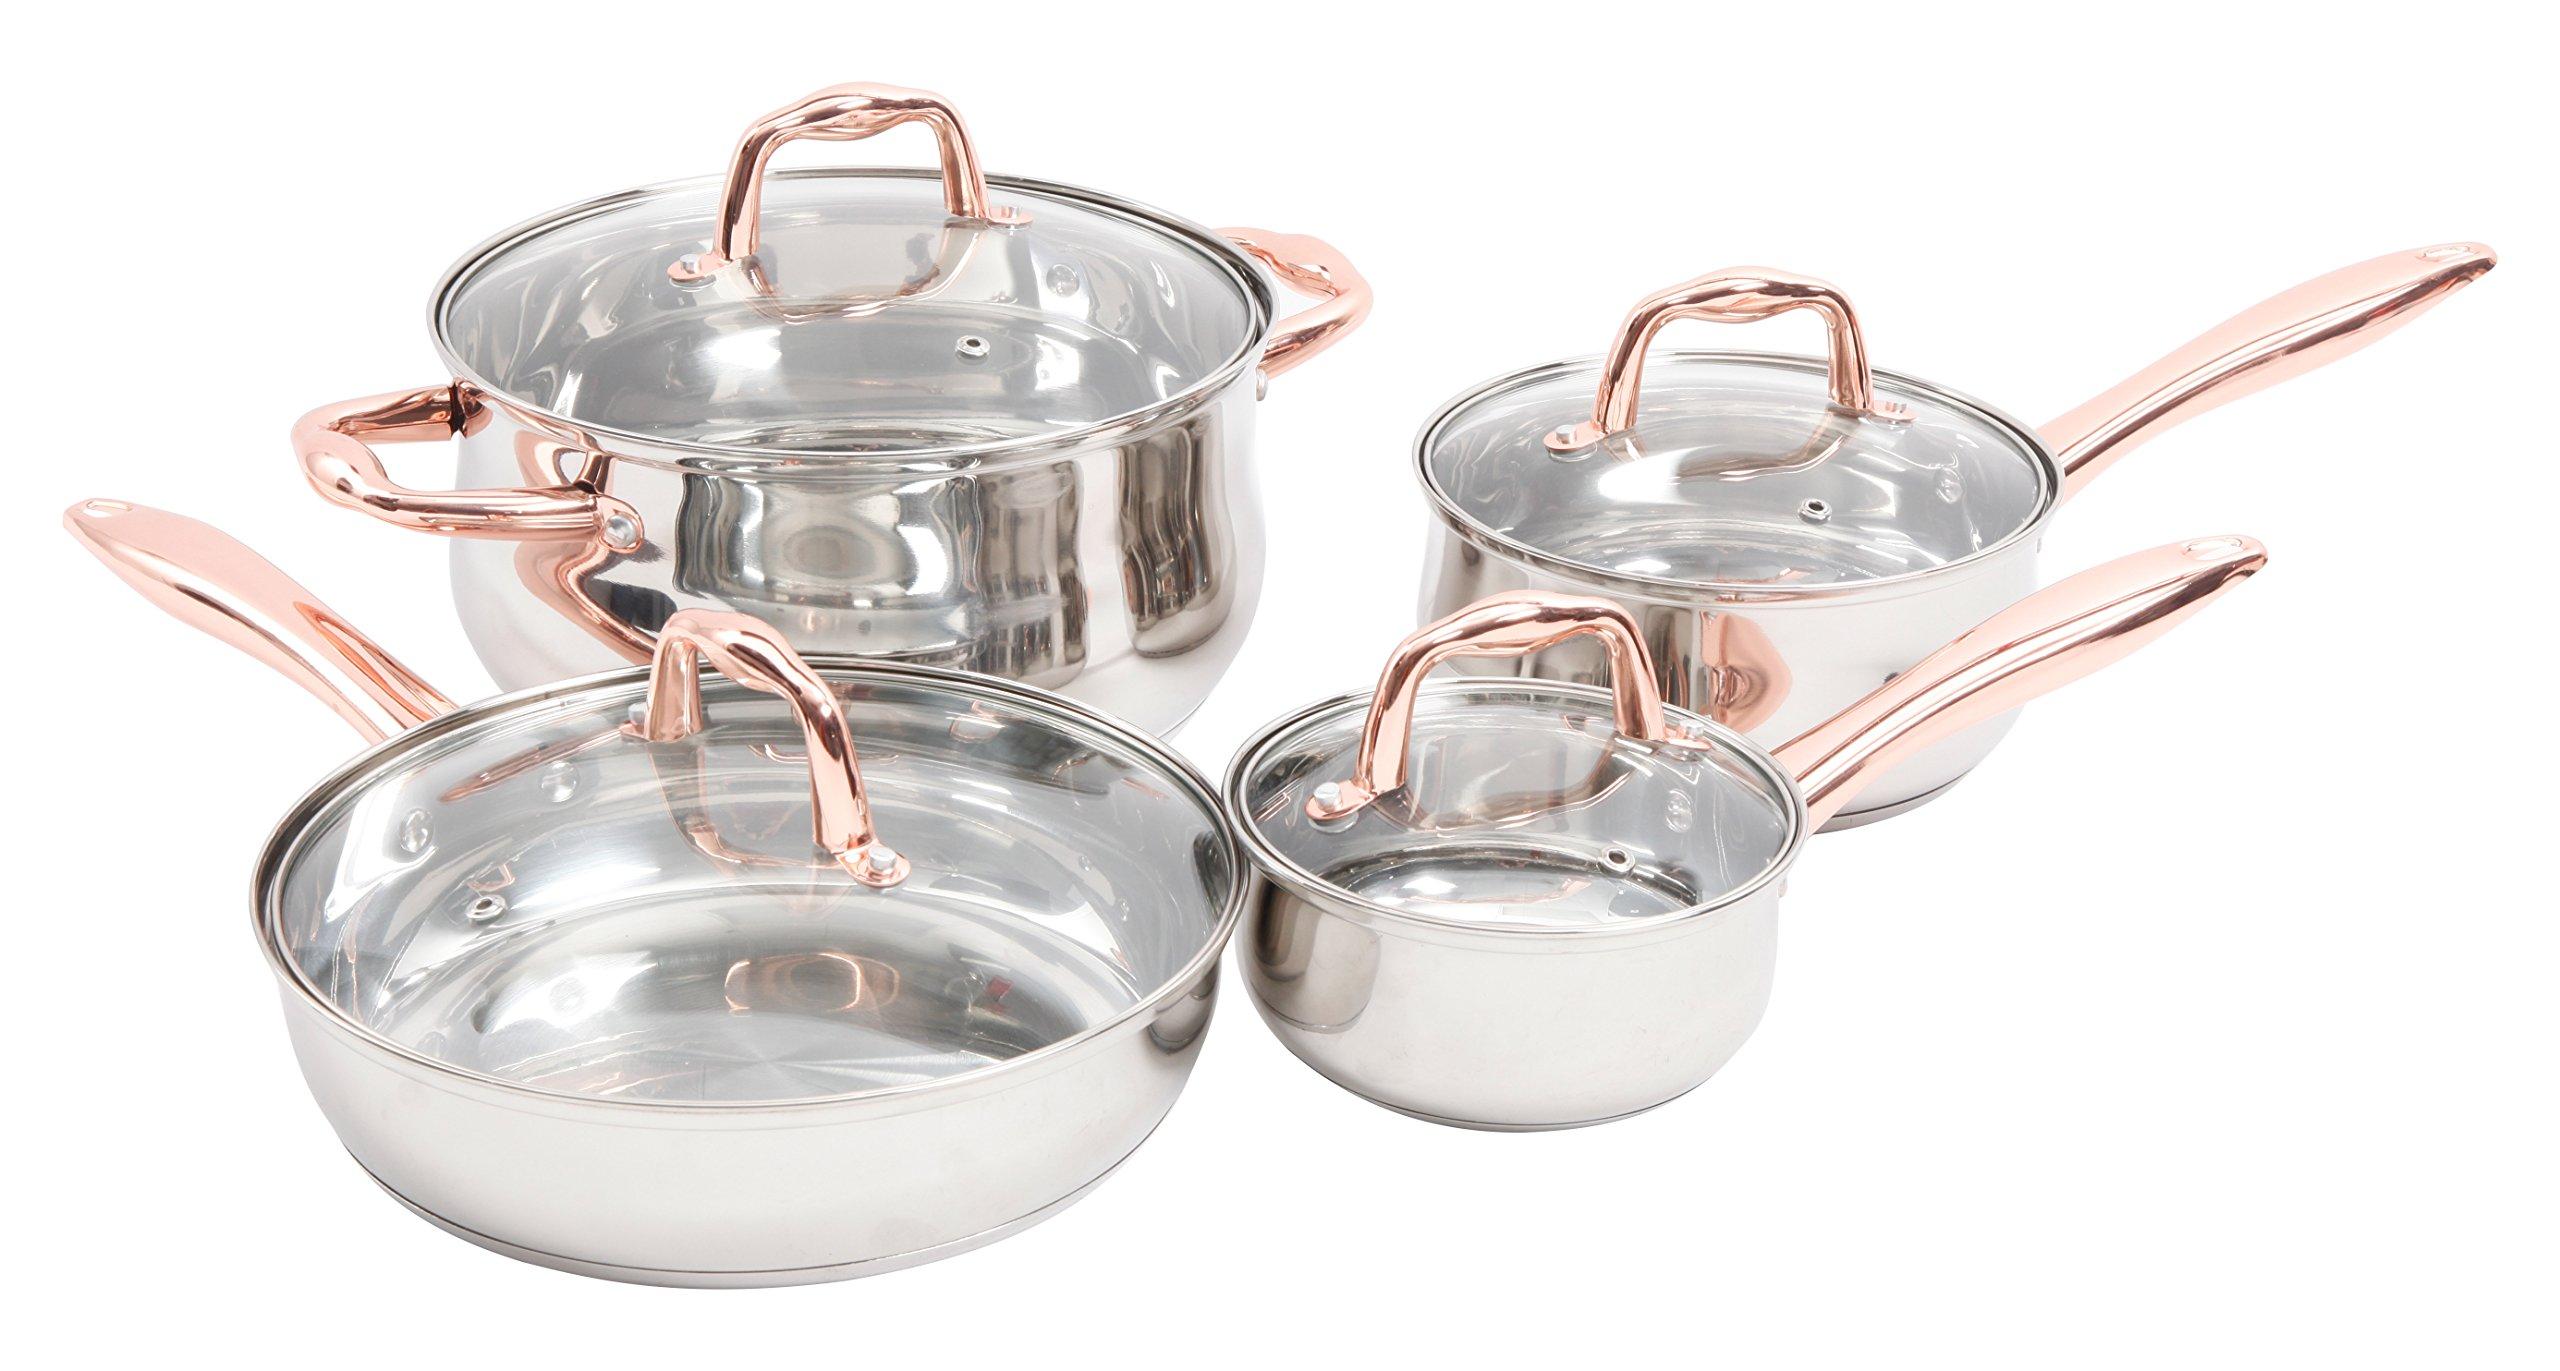 Sunbeam 112044.08 Branson 8 Piece Cookware Set, Stainless Steel, Copper Plate Handle